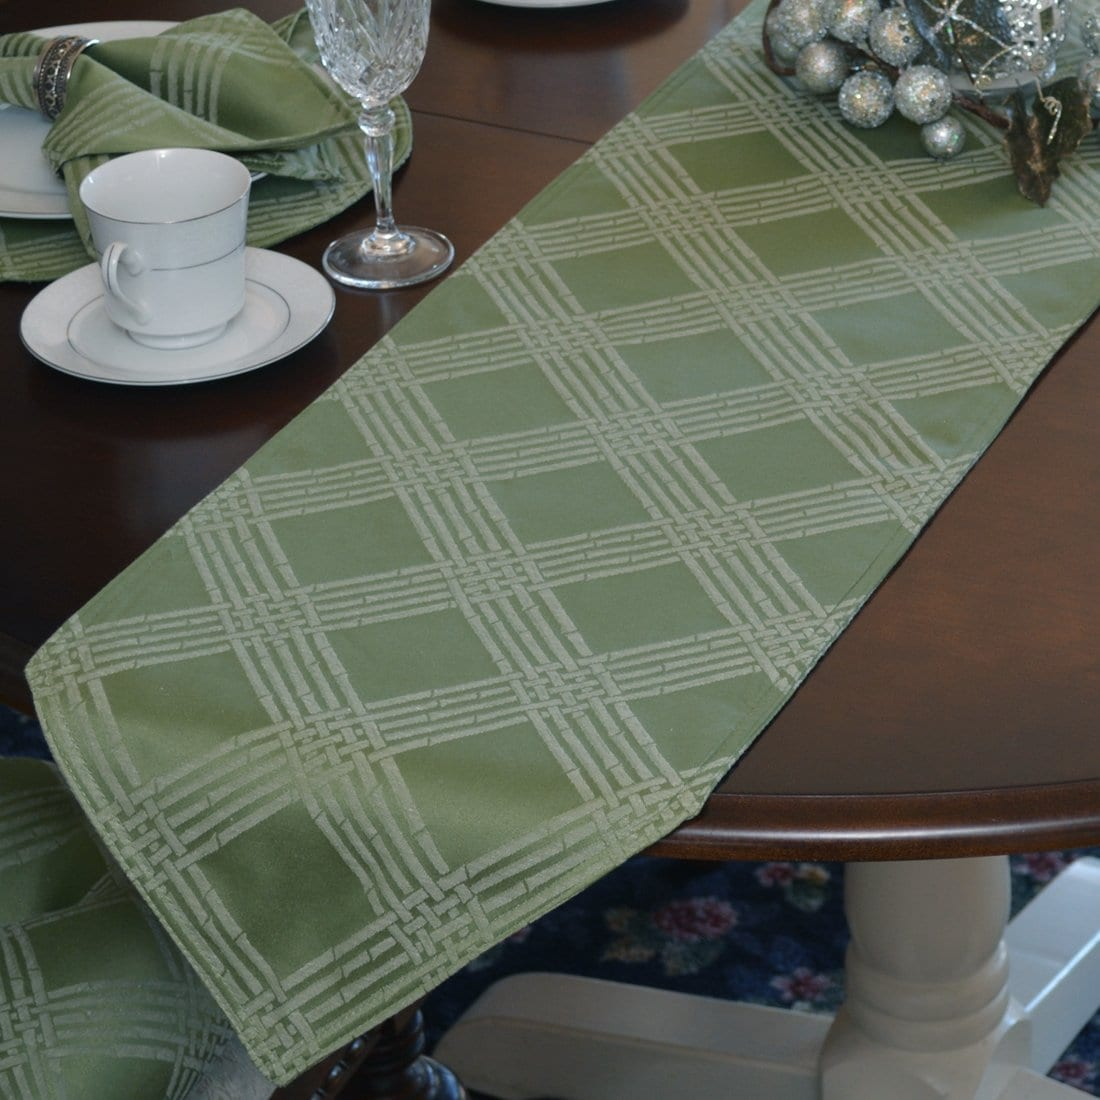 Sweet Pea Linens - Celery Green Lattice Jacquard 72 inch Table Runner (SKU#: R-1024-L22) - Table Setting